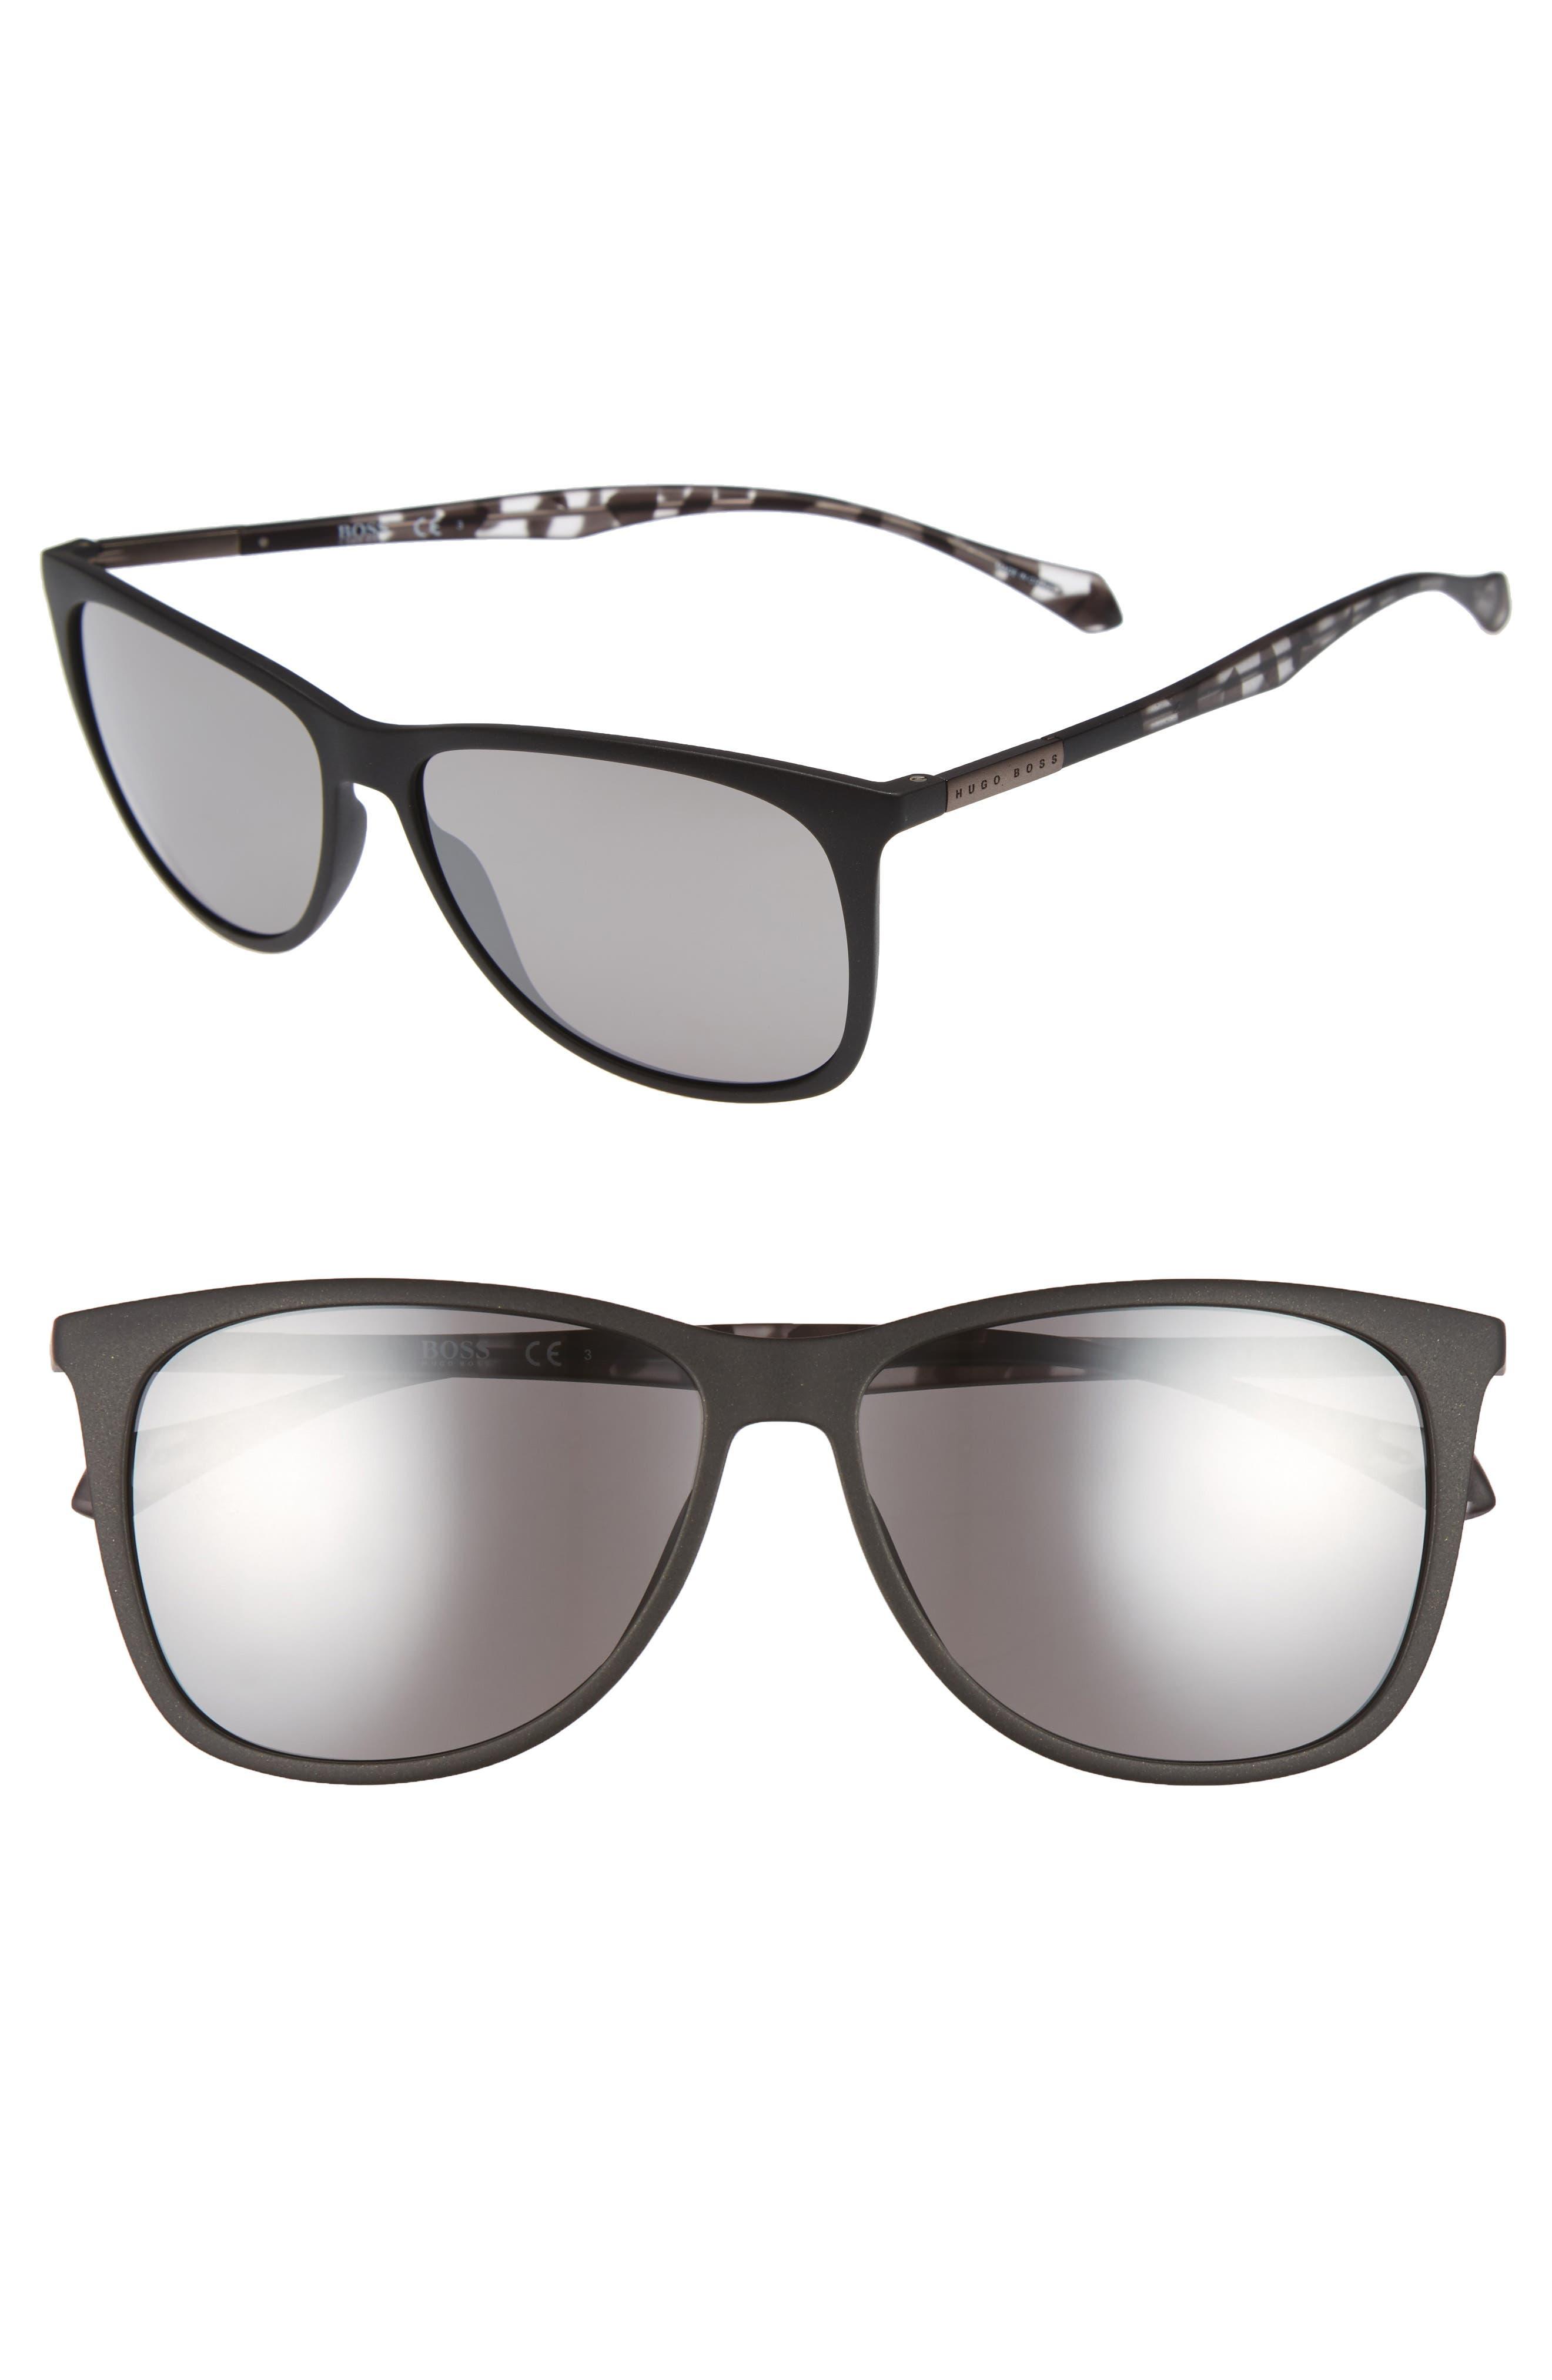 58mm Sunglasses,                             Main thumbnail 1, color,                             002